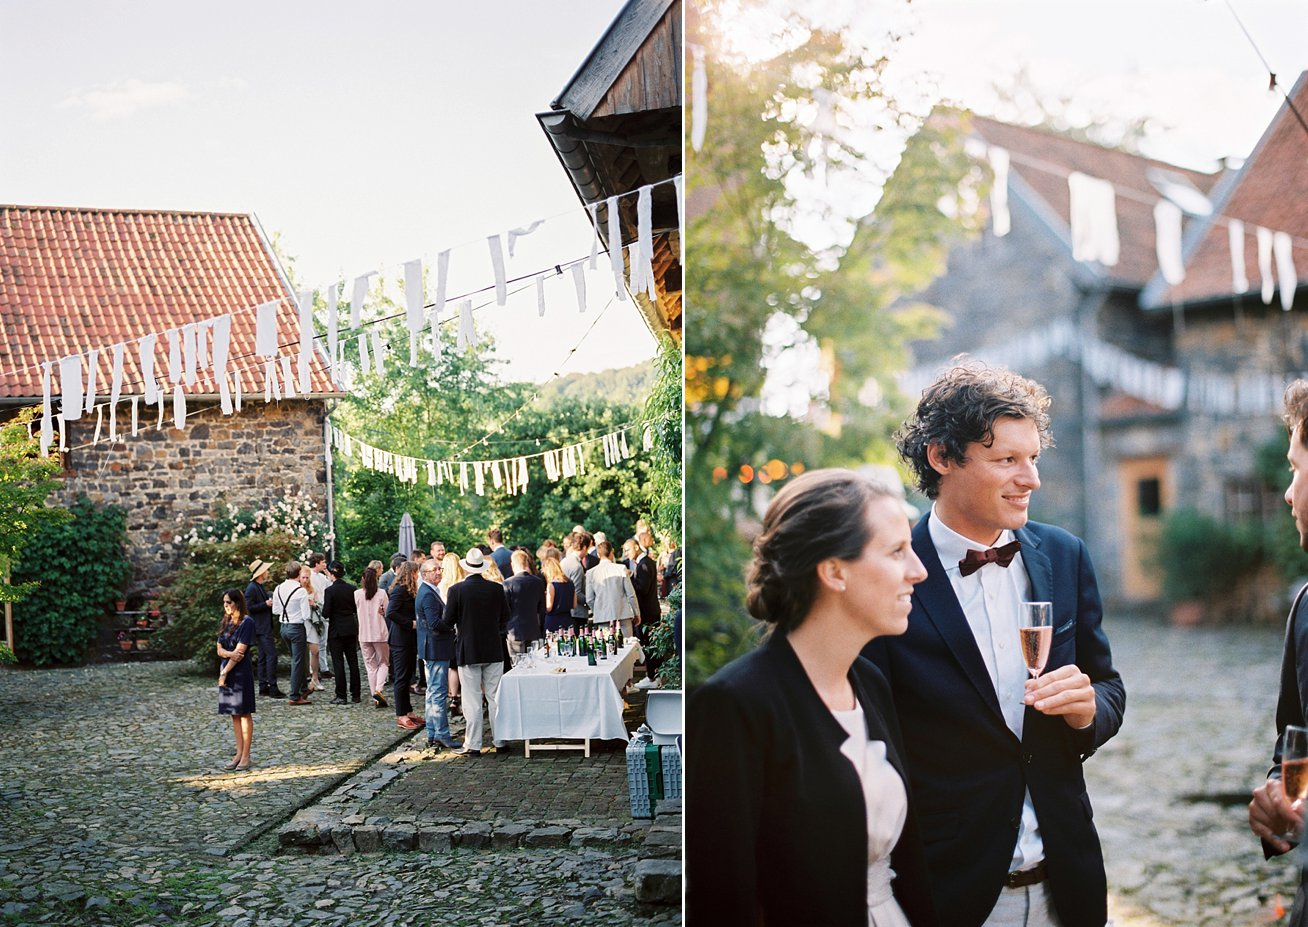 Amanda-Drost-photography-wedding-bruioft-zuid-limburg-hoeve-vernelsveld_0045.jpg